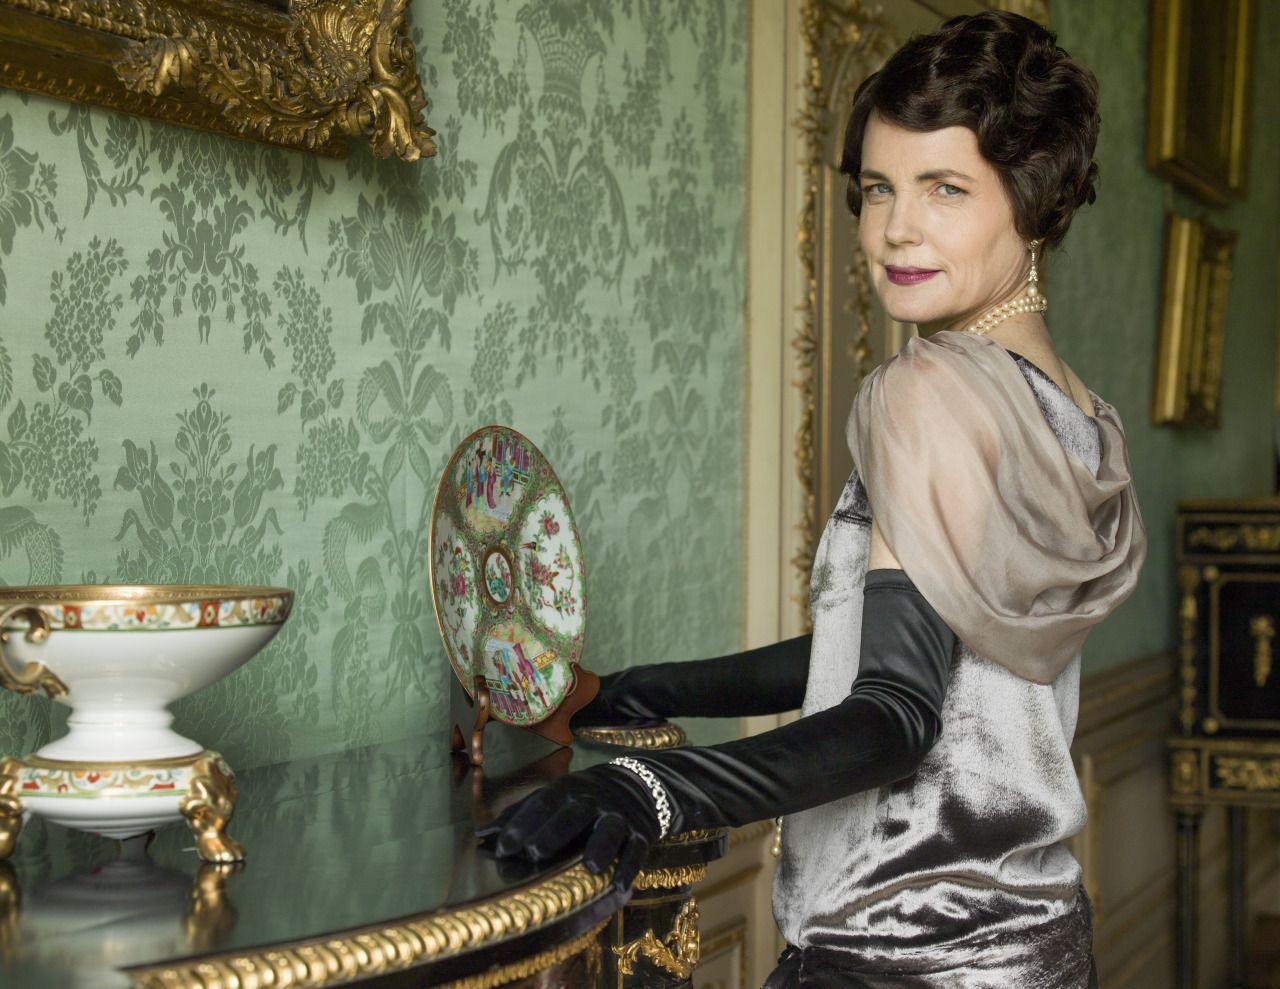 Elizabeth McGovern wearing opera gloves in Downton Abbey ...